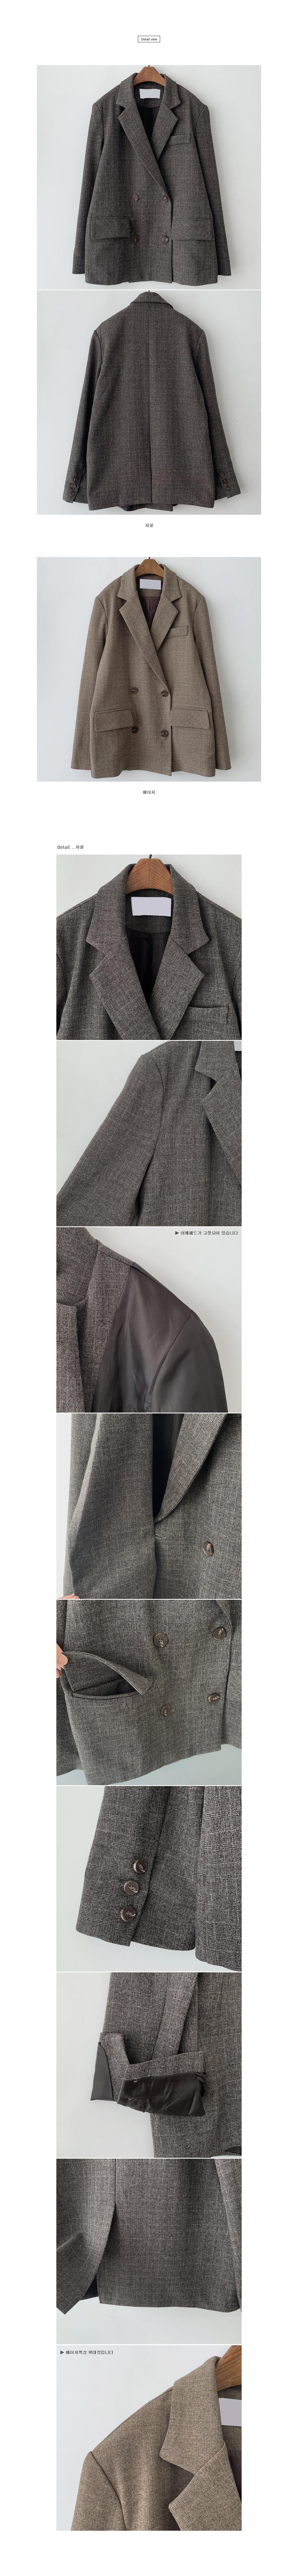 Solde Check Double Jacket